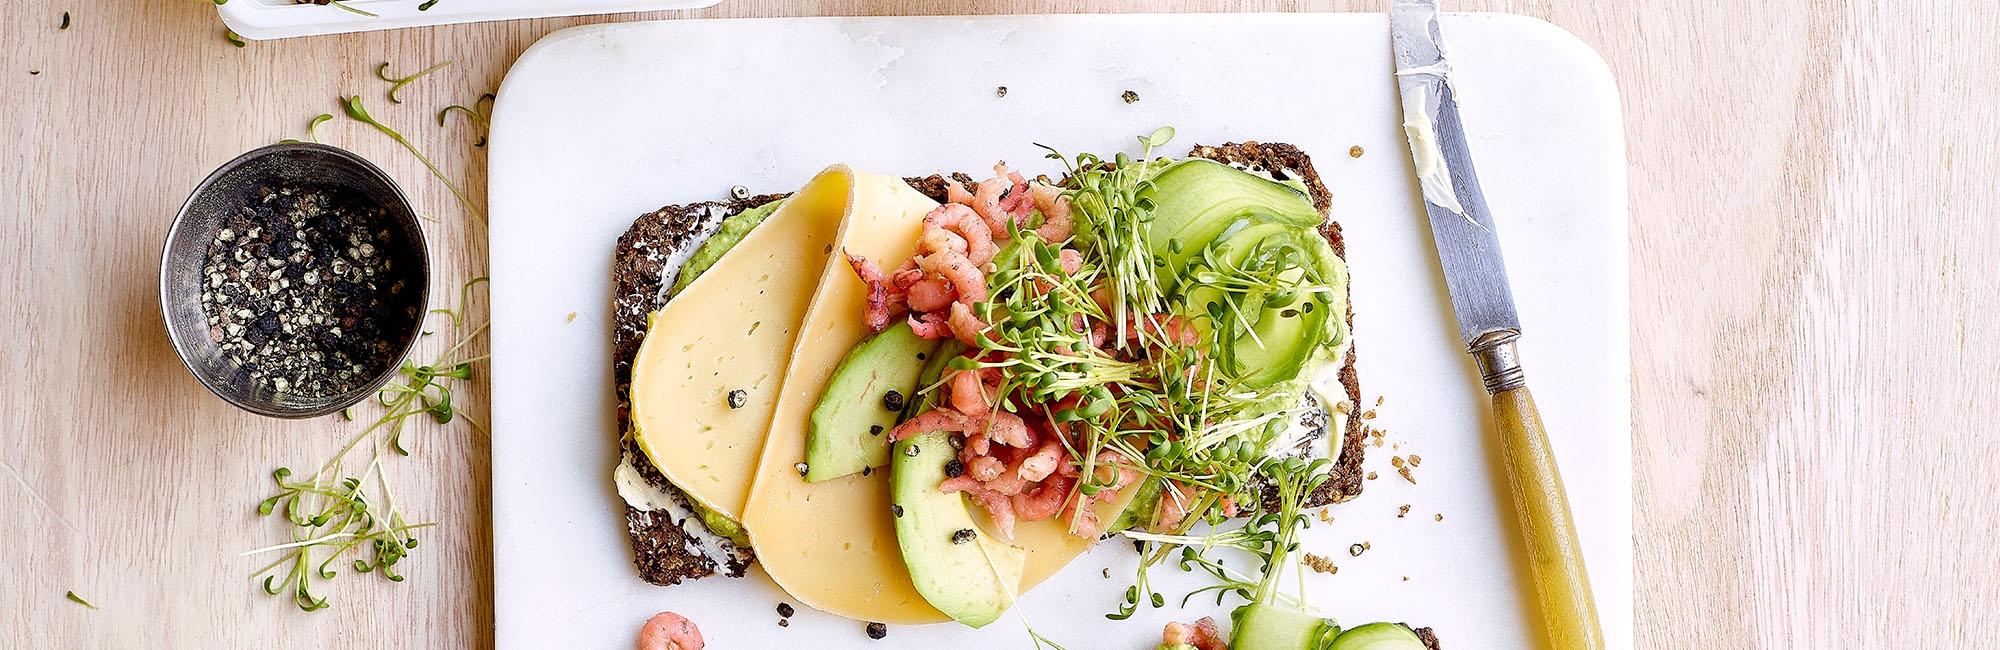 brood, kaas, komkommer, garnalen, tuinkers, avocado, pesto, avocadopesto